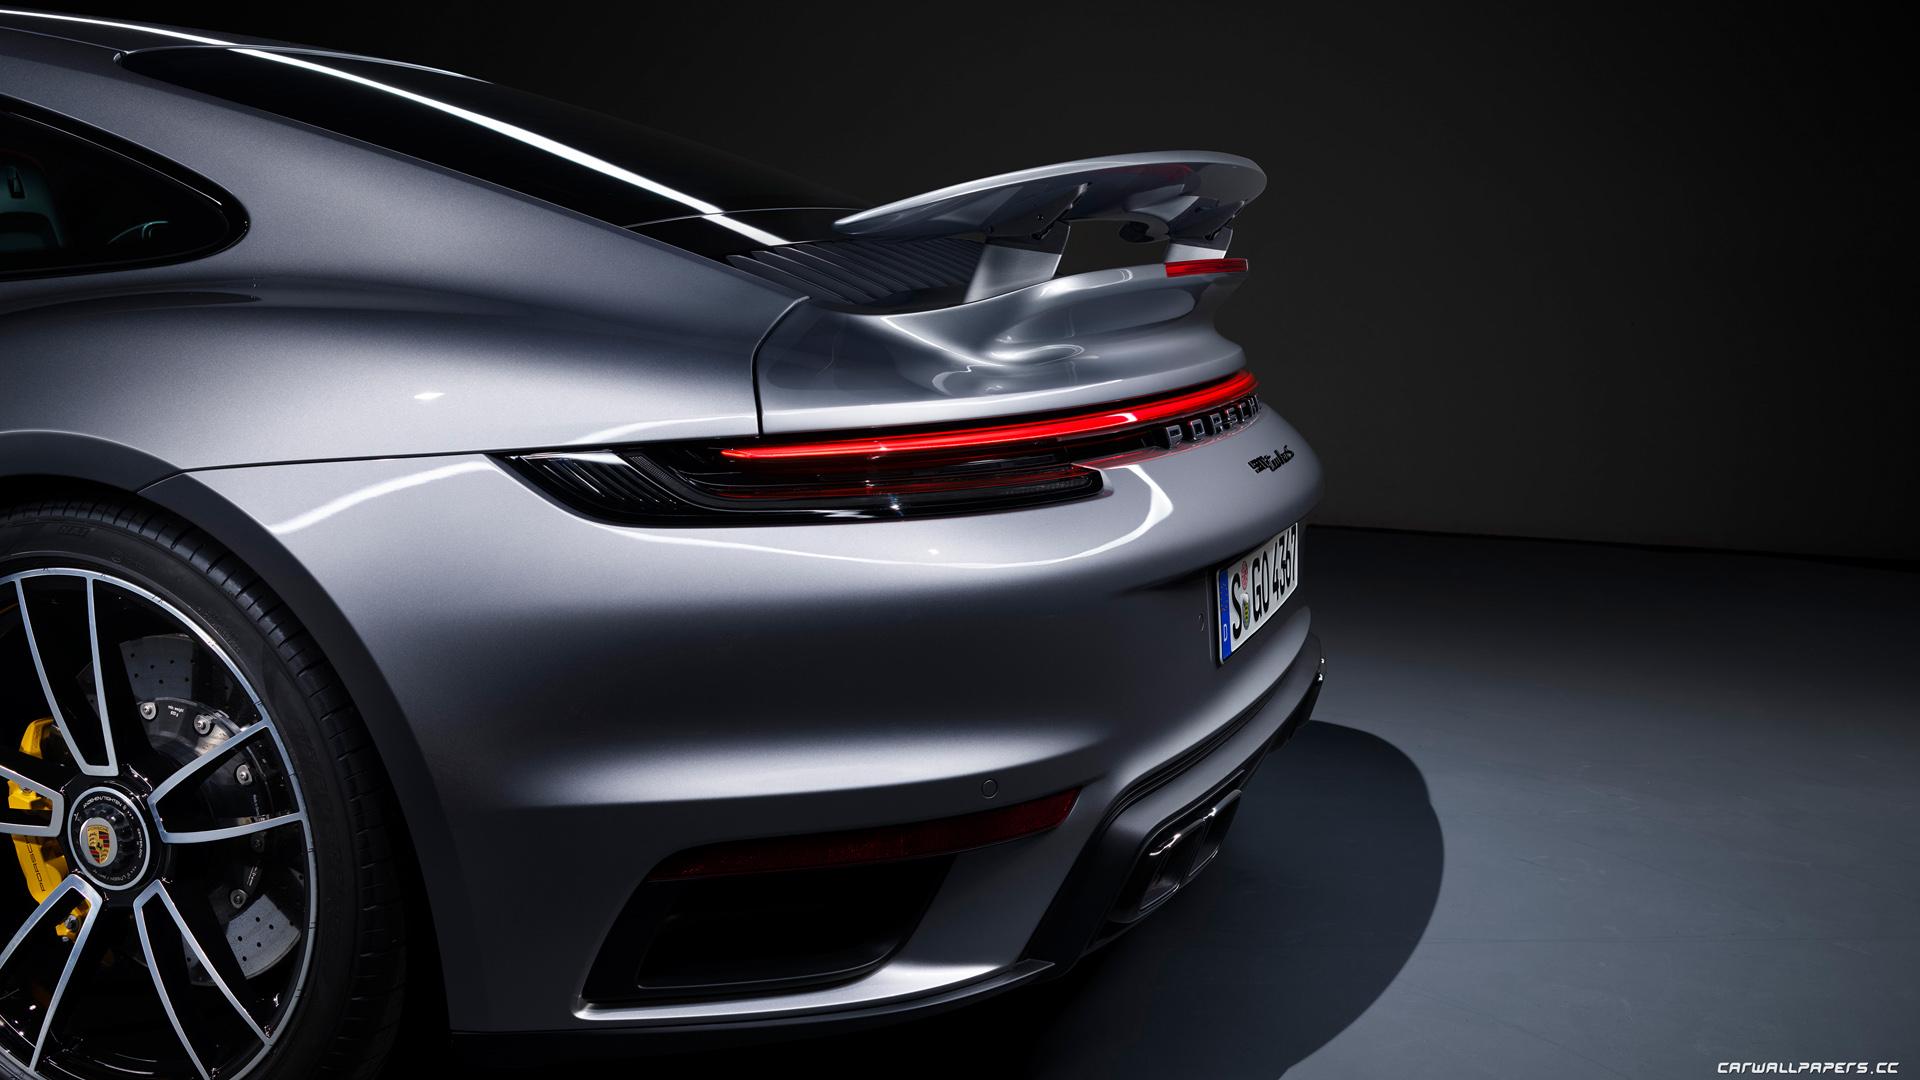 Cars Desktop Wallpapers Porsche 911 Turbo S 2020 Page 2